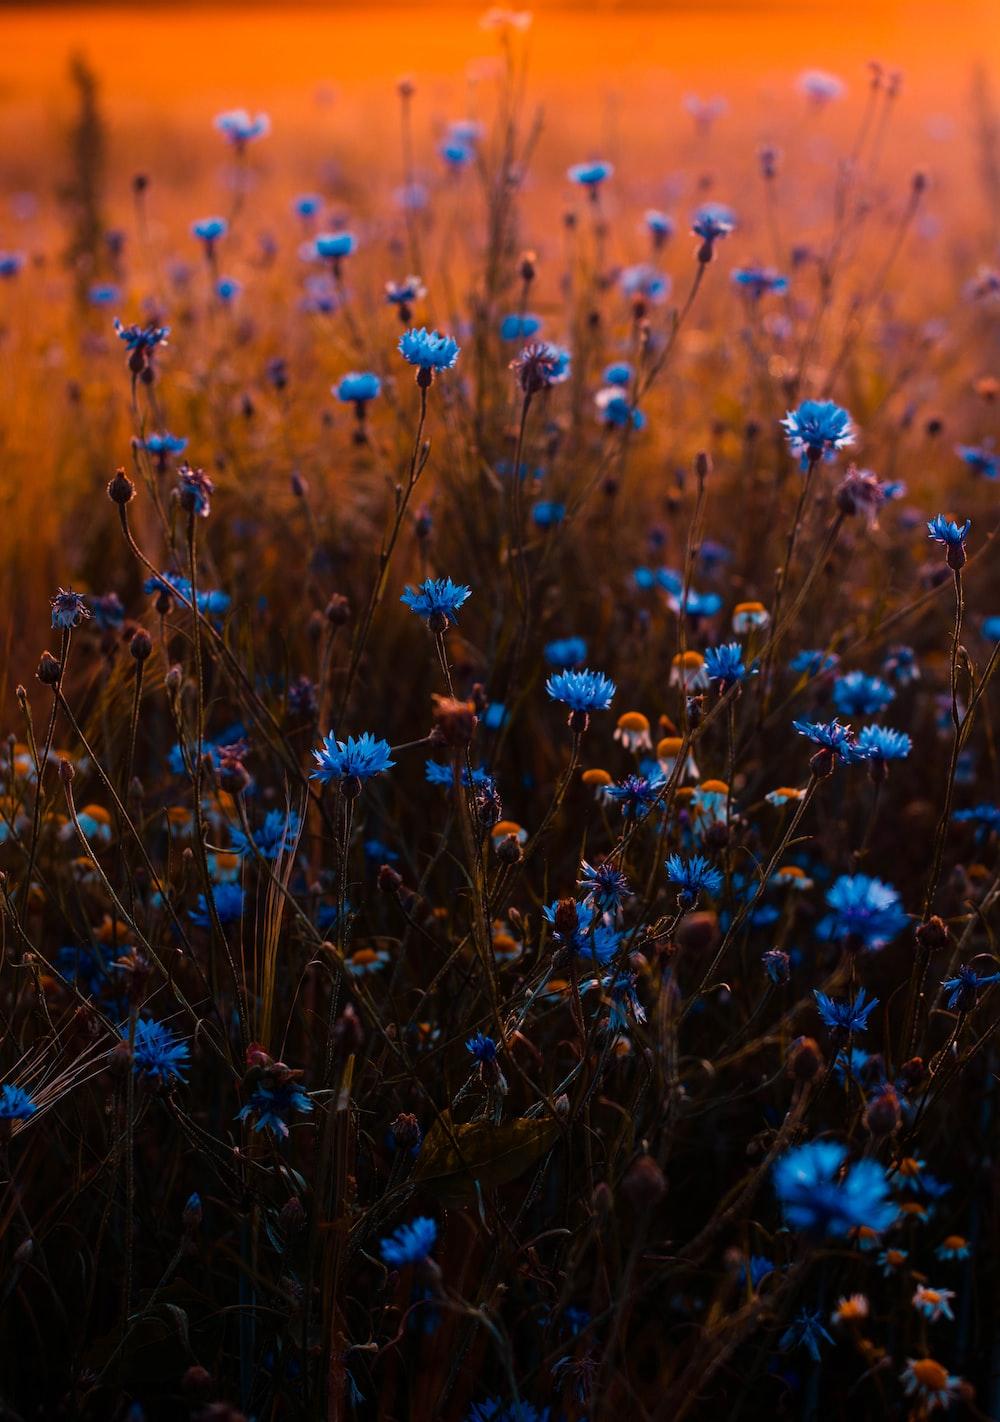 closeup photo of blue petaled flowers